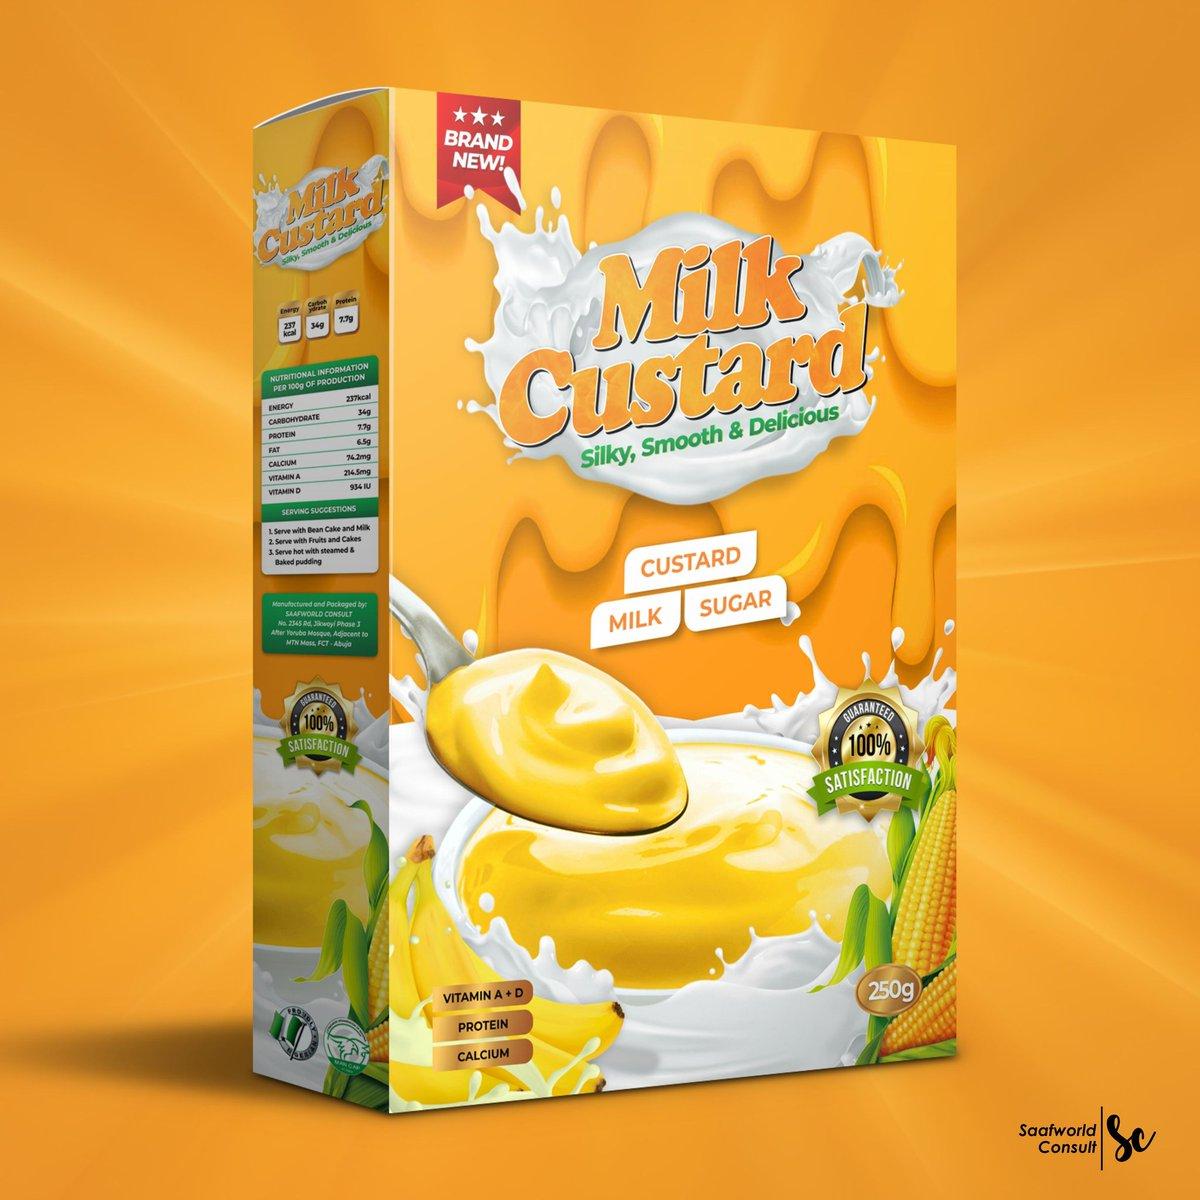 Hey there! What do you think of my package design, slide left for more >>>  #eidmubarak2020 #mondaythoughts #graphicdesign #graphicdesigner #coreldraw #photoshop #abuja #abujadesigner #behance #pinterest #supernatural #production #food #packagingdesignpic.twitter.com/ocEJirHQuz